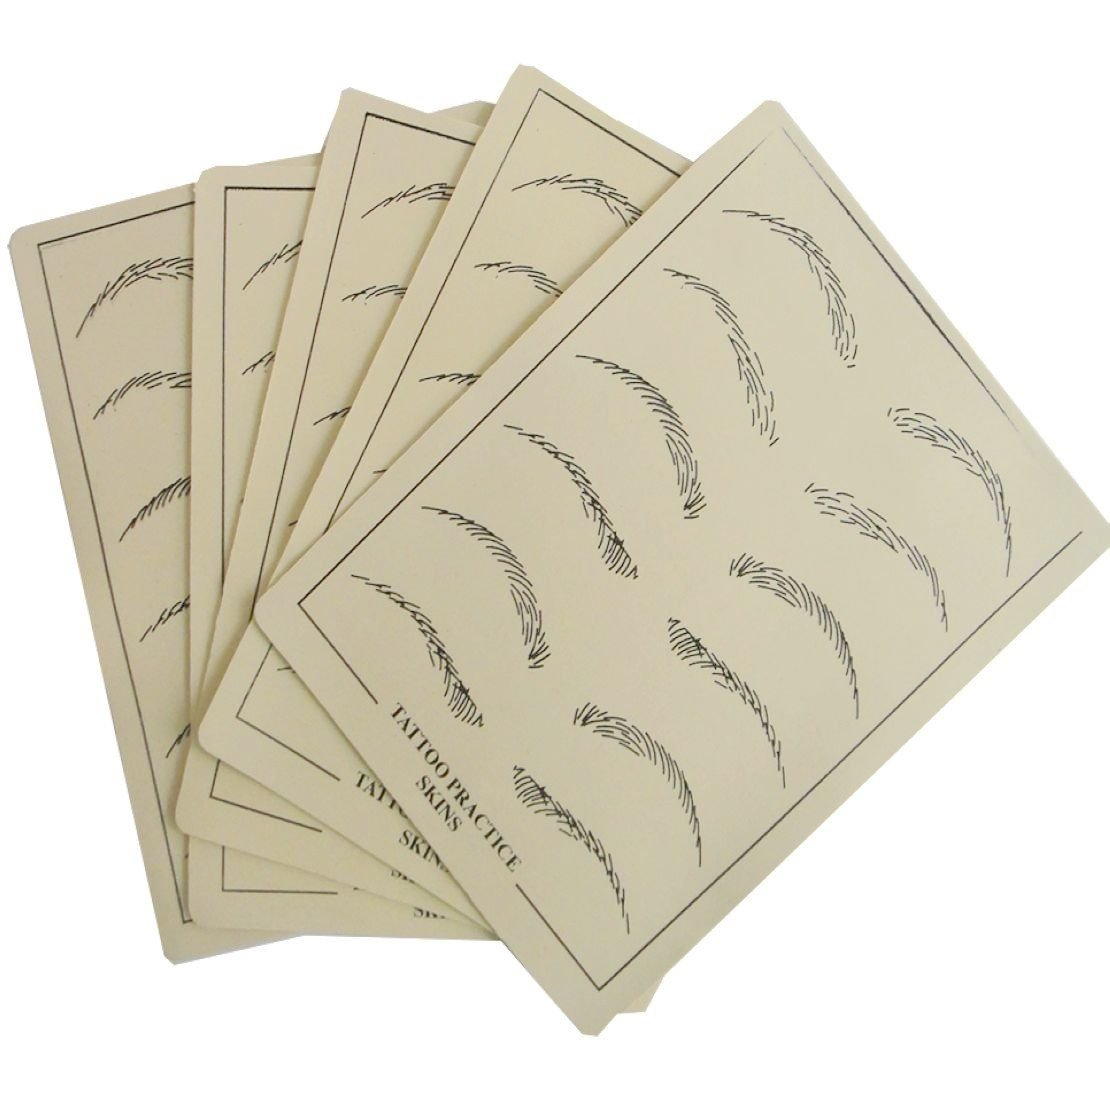 4e7096ef12 Amazon.com  Microblading Practice Skin